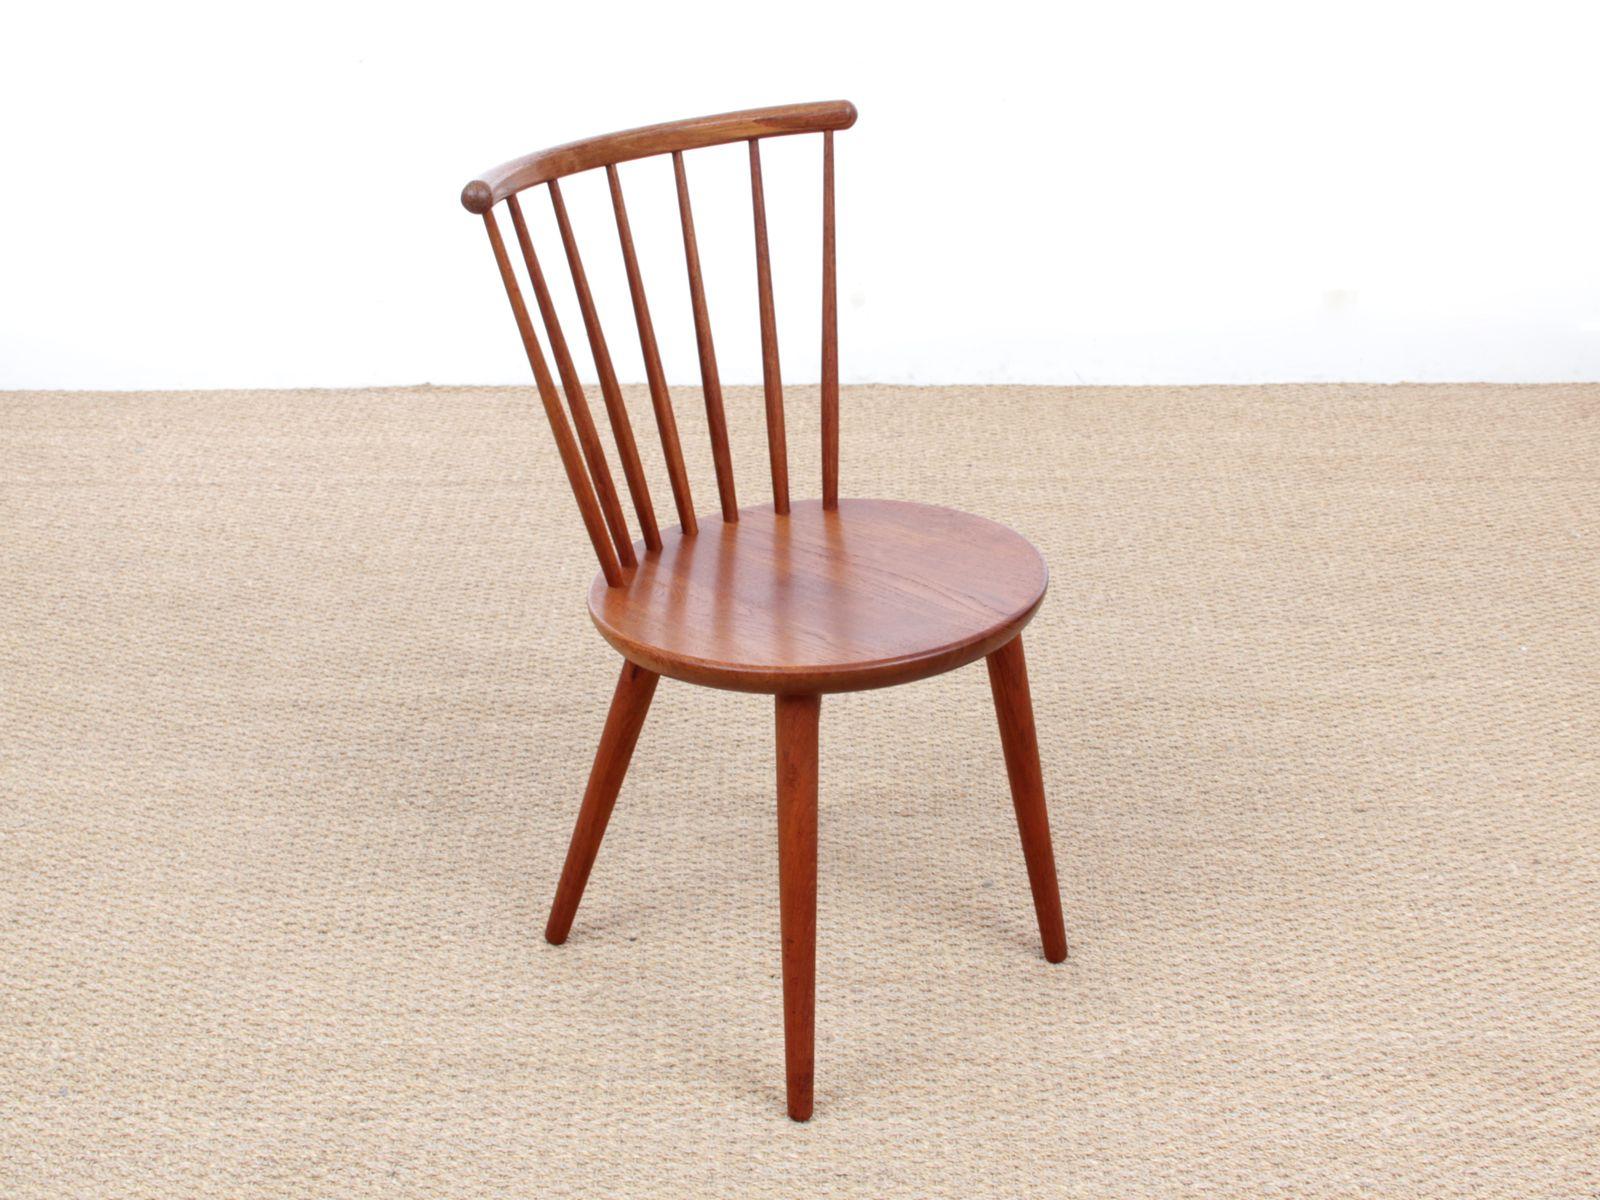 skandinavische vintage st hle aus teak 2er set bei pamono kaufen. Black Bedroom Furniture Sets. Home Design Ideas